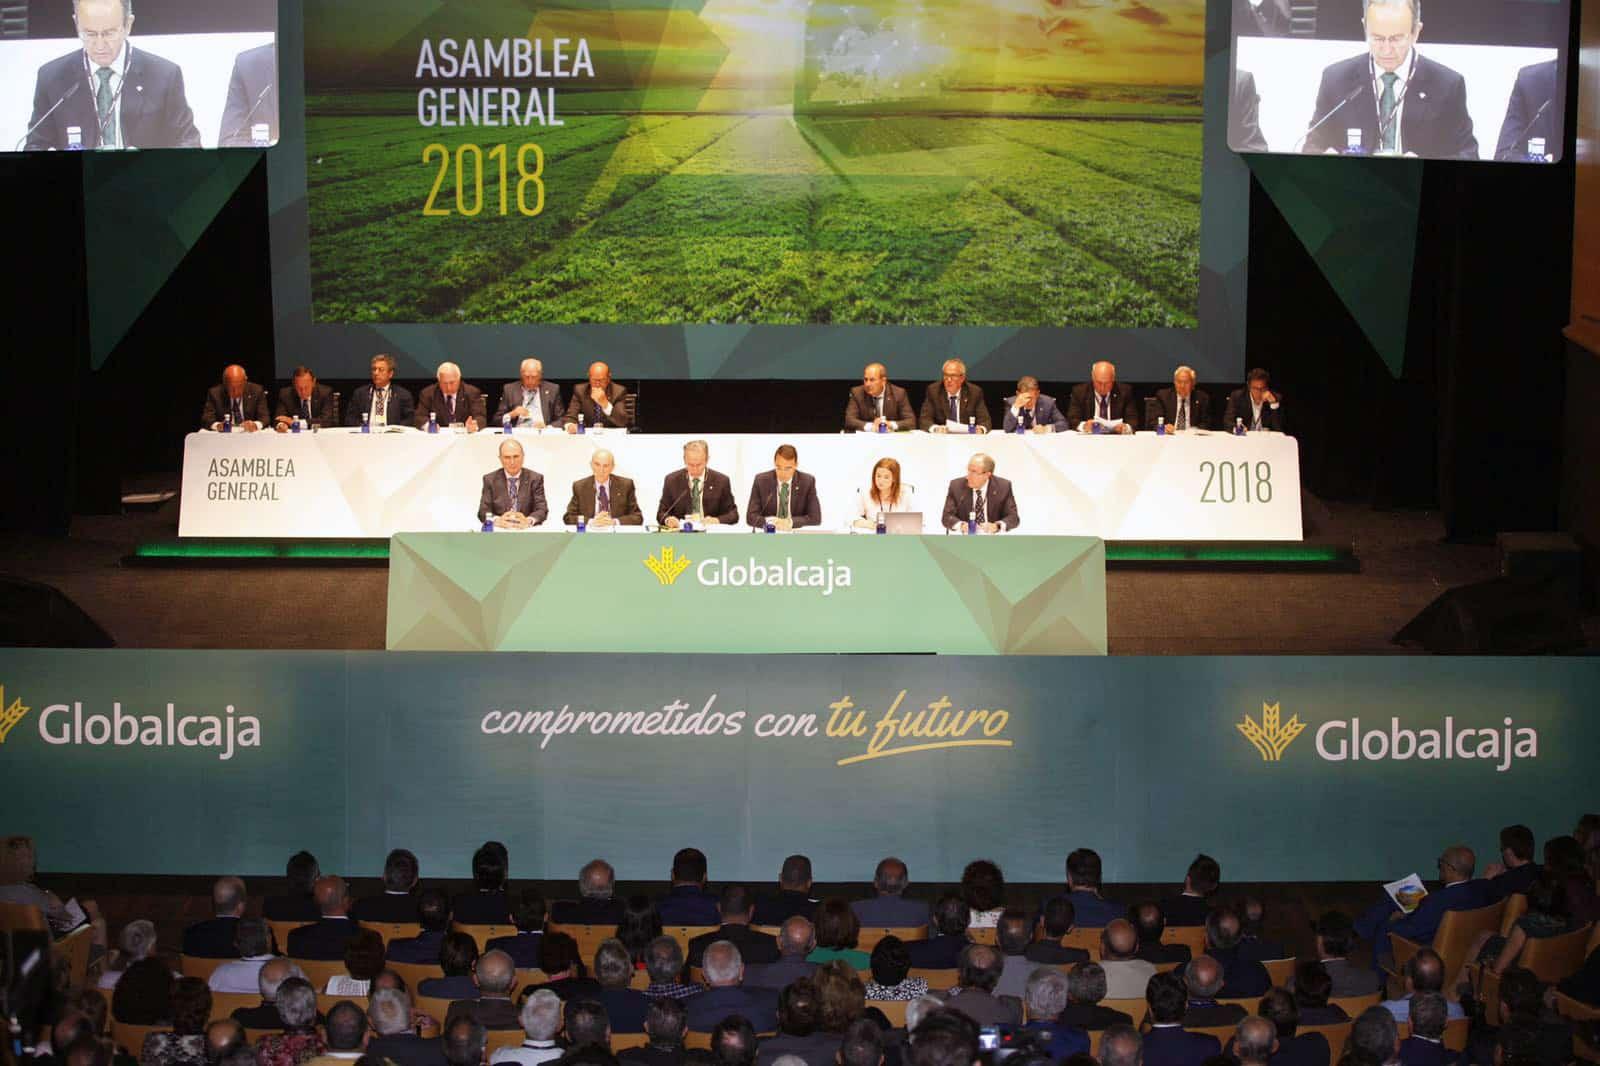 https://blog.globalcaja.es/wp-content/uploads/2018/05/asamblea-Globalcaja.jpg